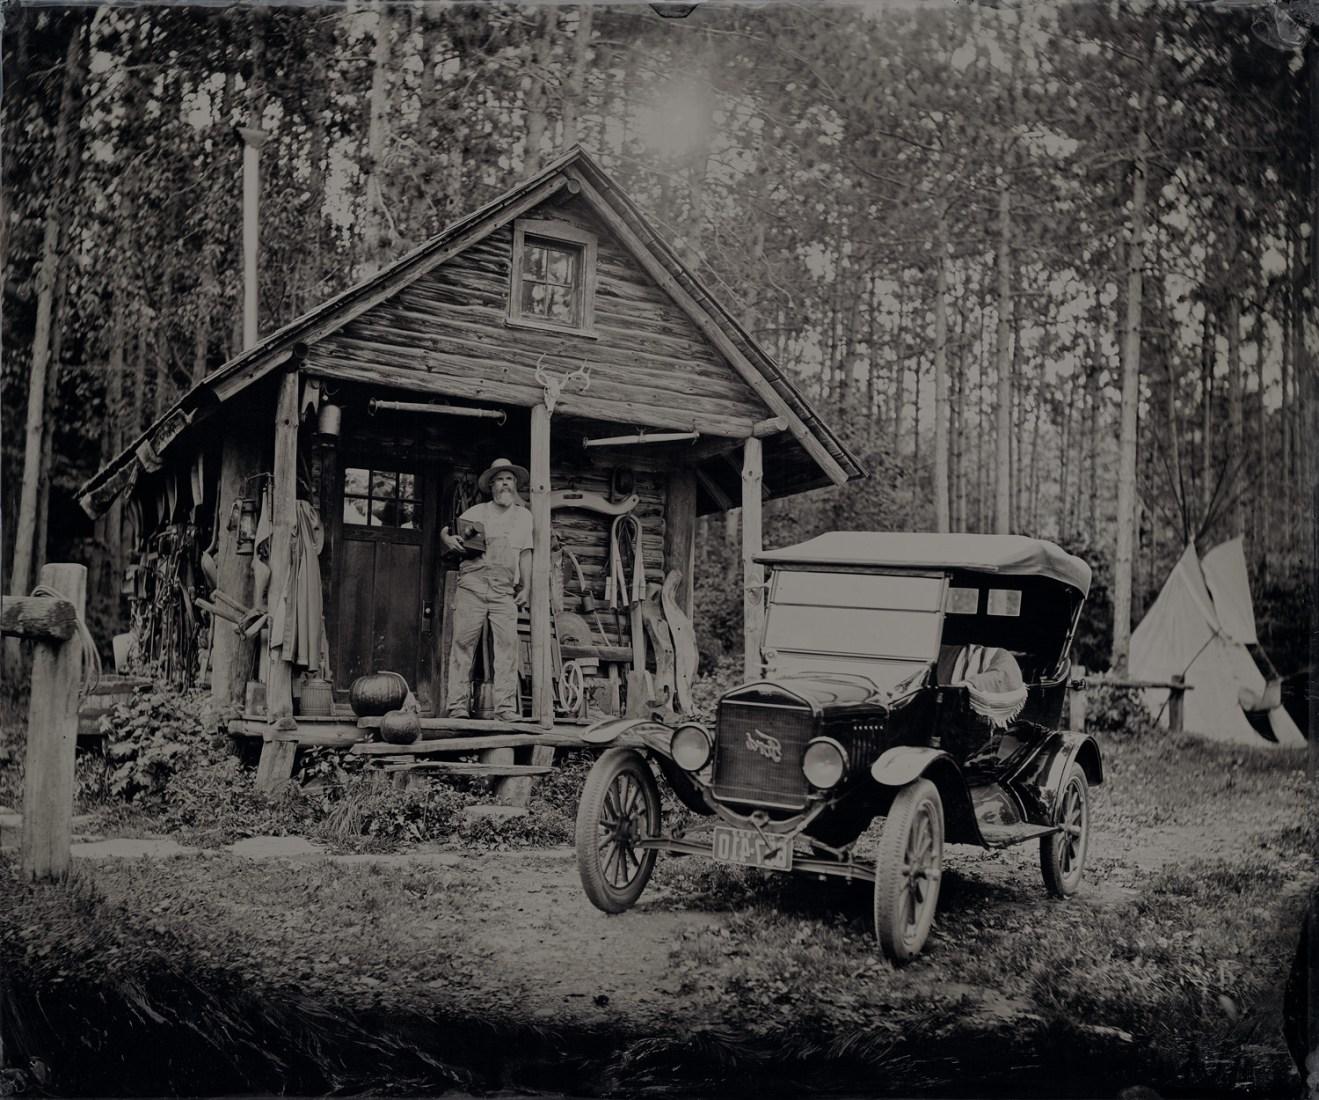 WP015-27-Camp-Tintype-20x30-Alu-1500px